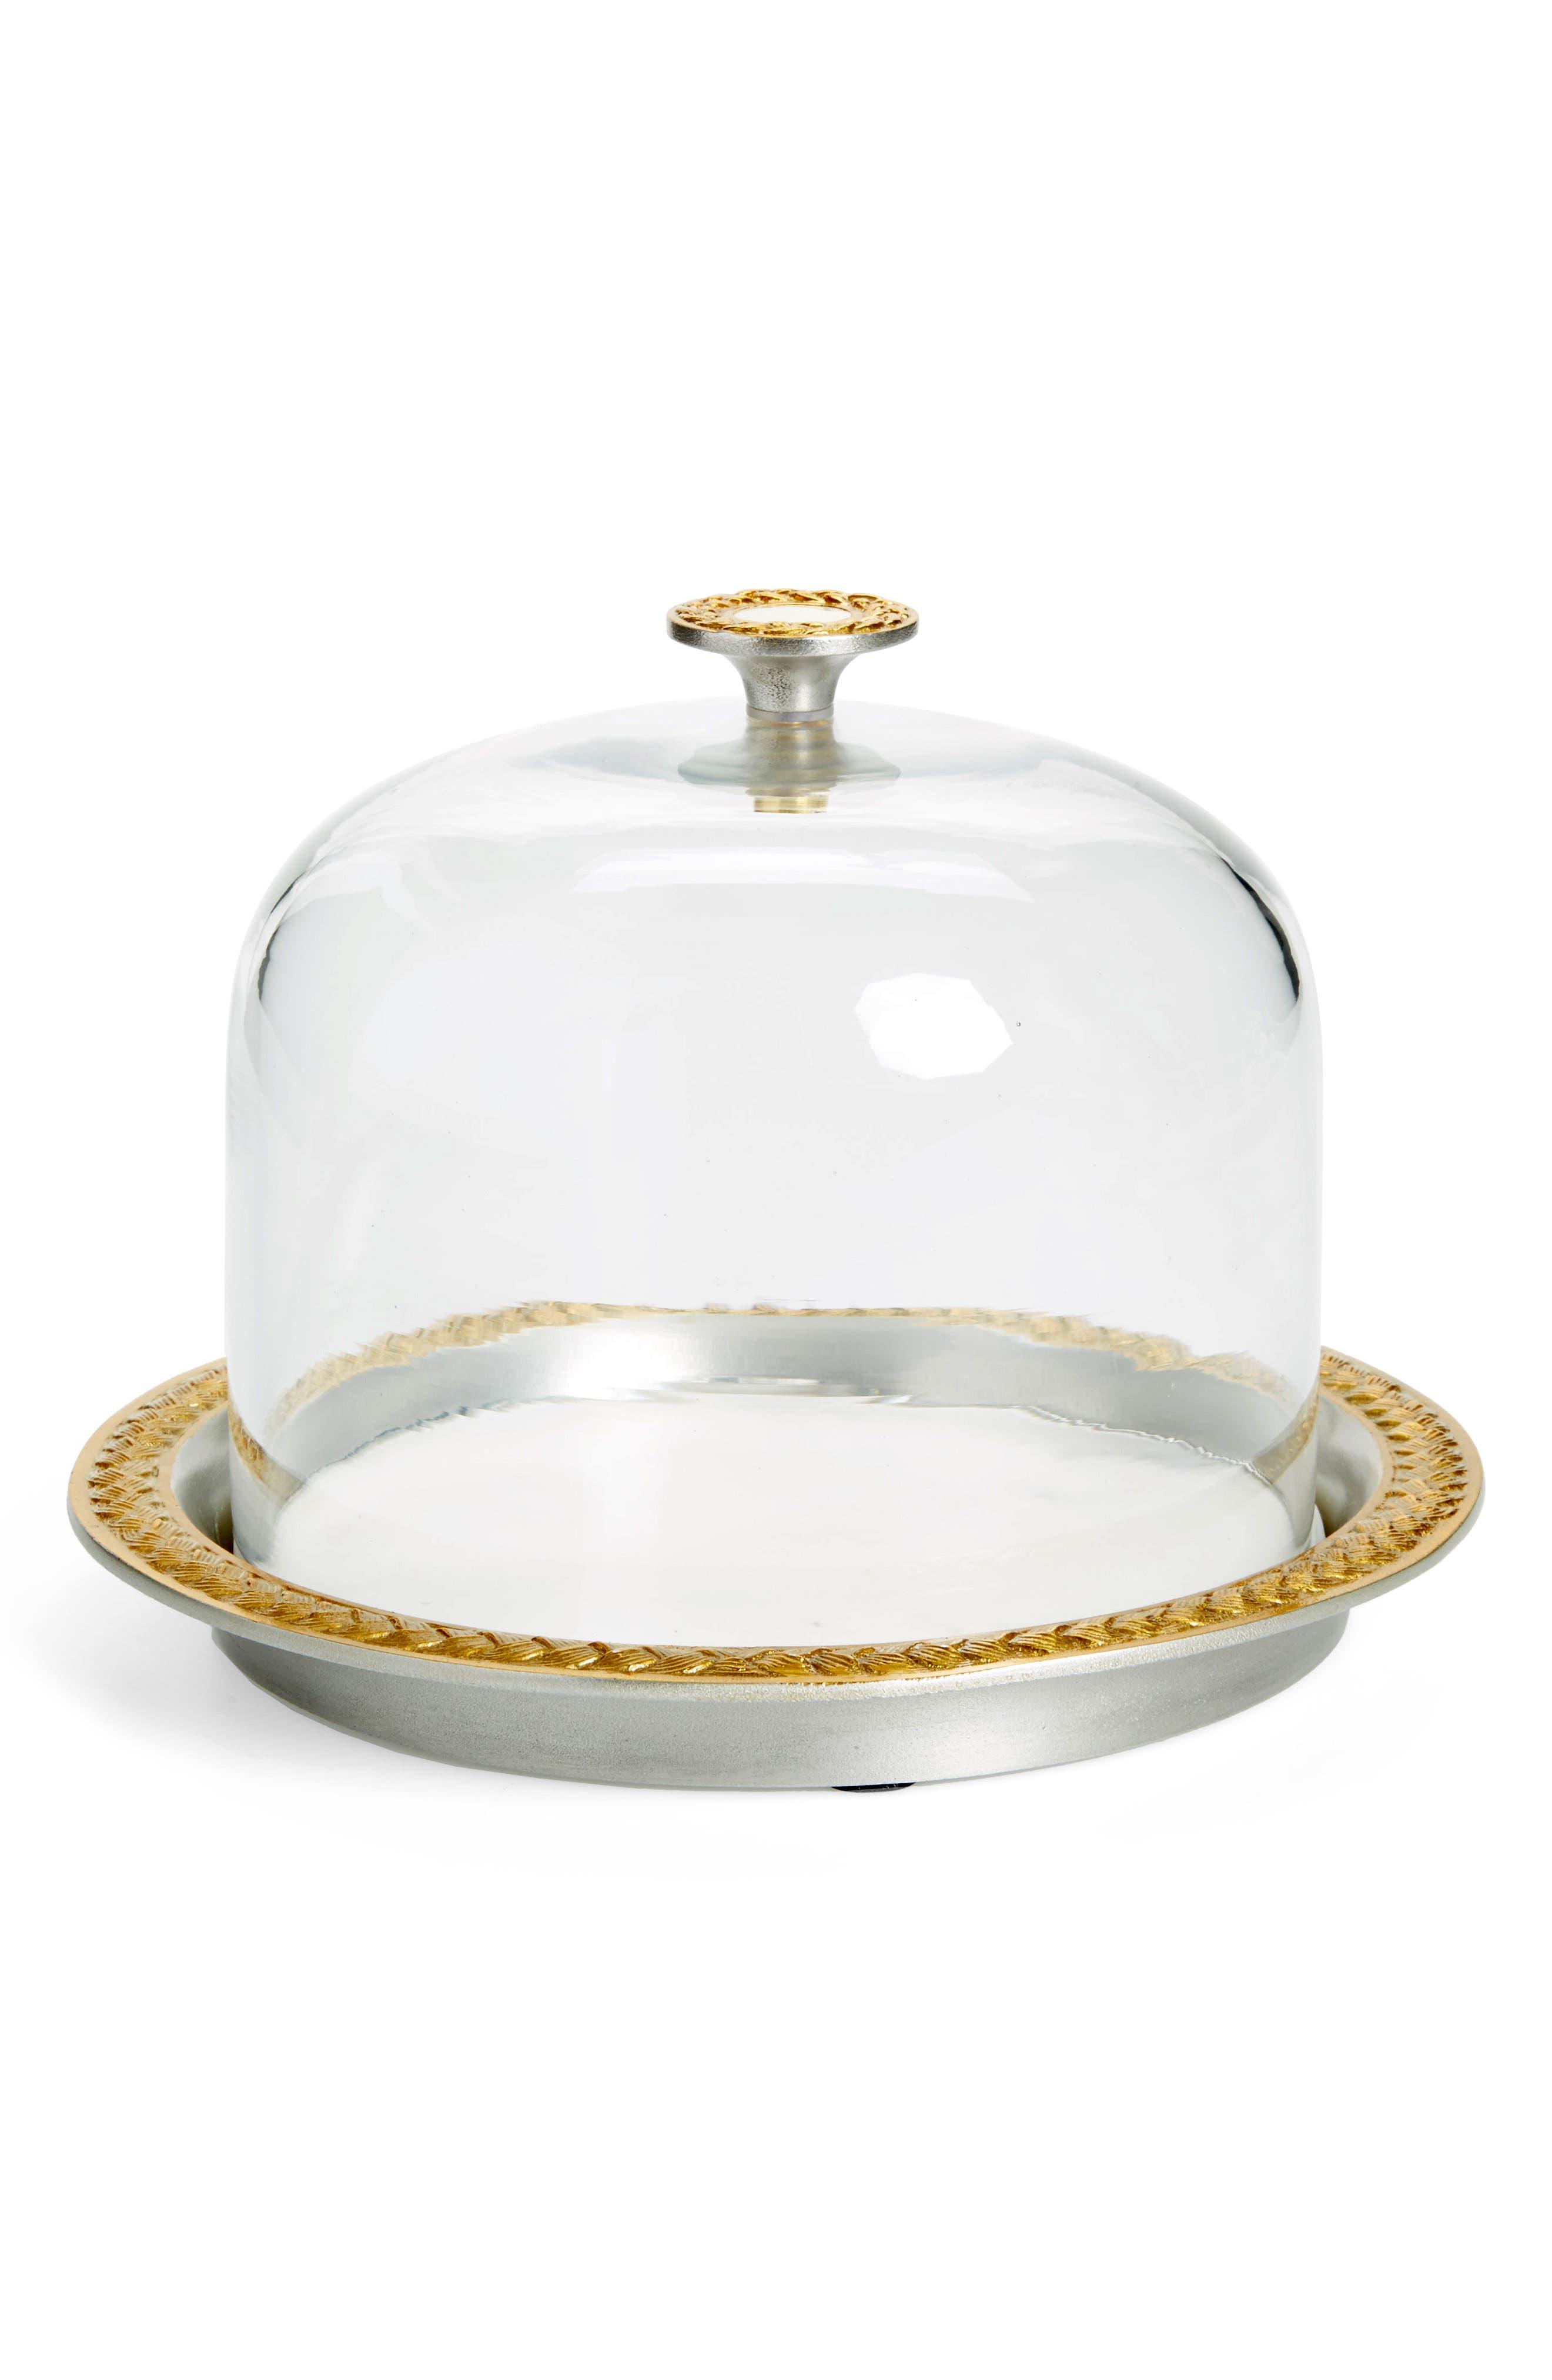 Marigold Artisans Braid Glass & Metal Cloche